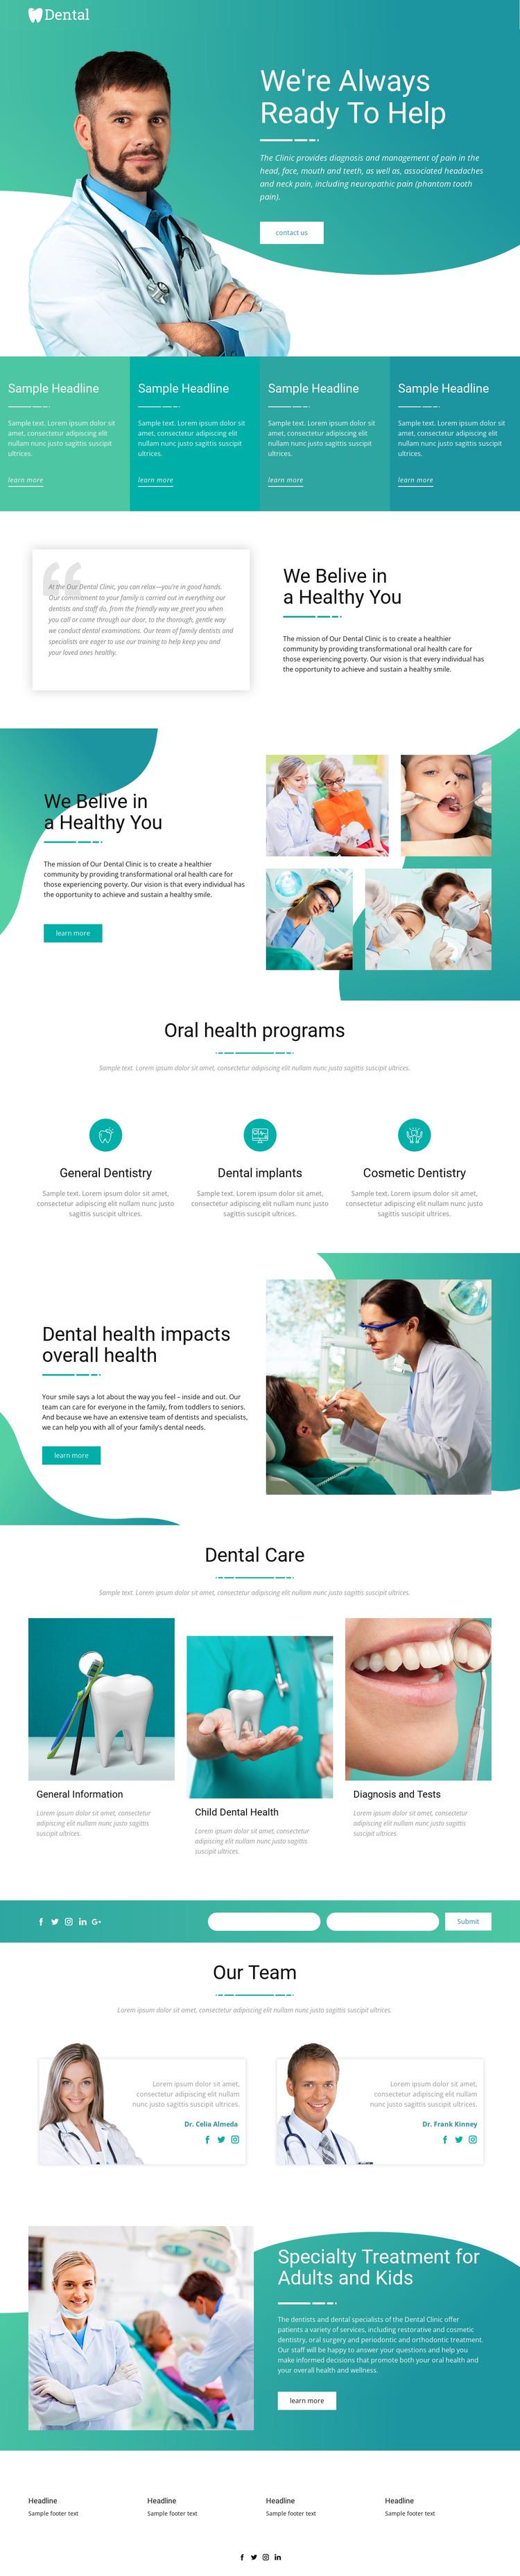 Serving and helping medicine Web Design